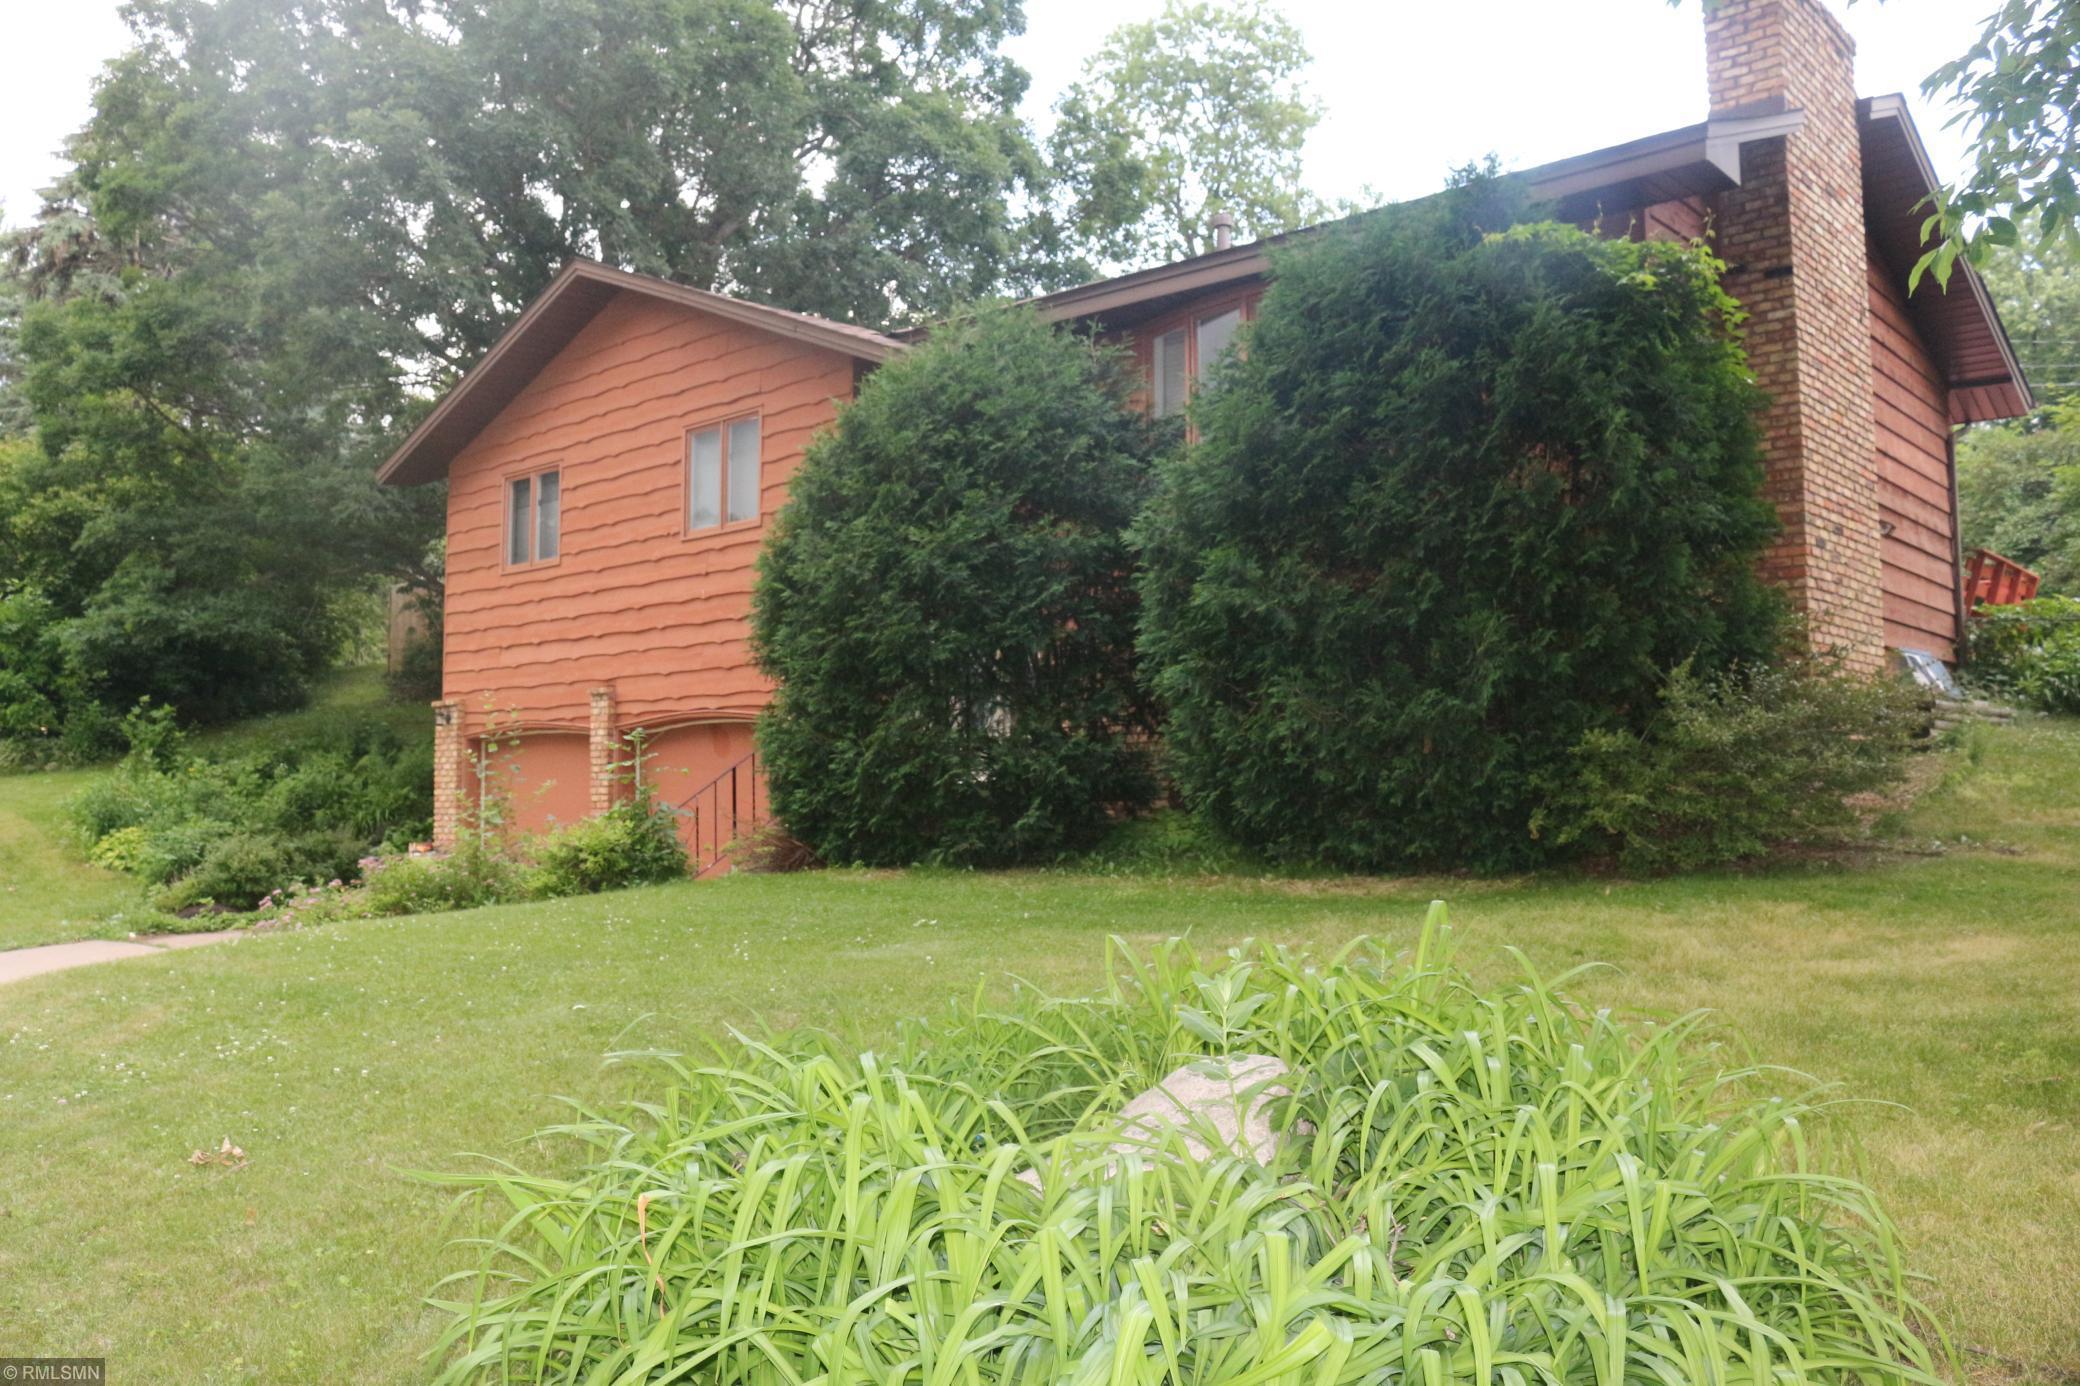 1380 Pierce NE Property Photo - Columbia Heights, MN real estate listing